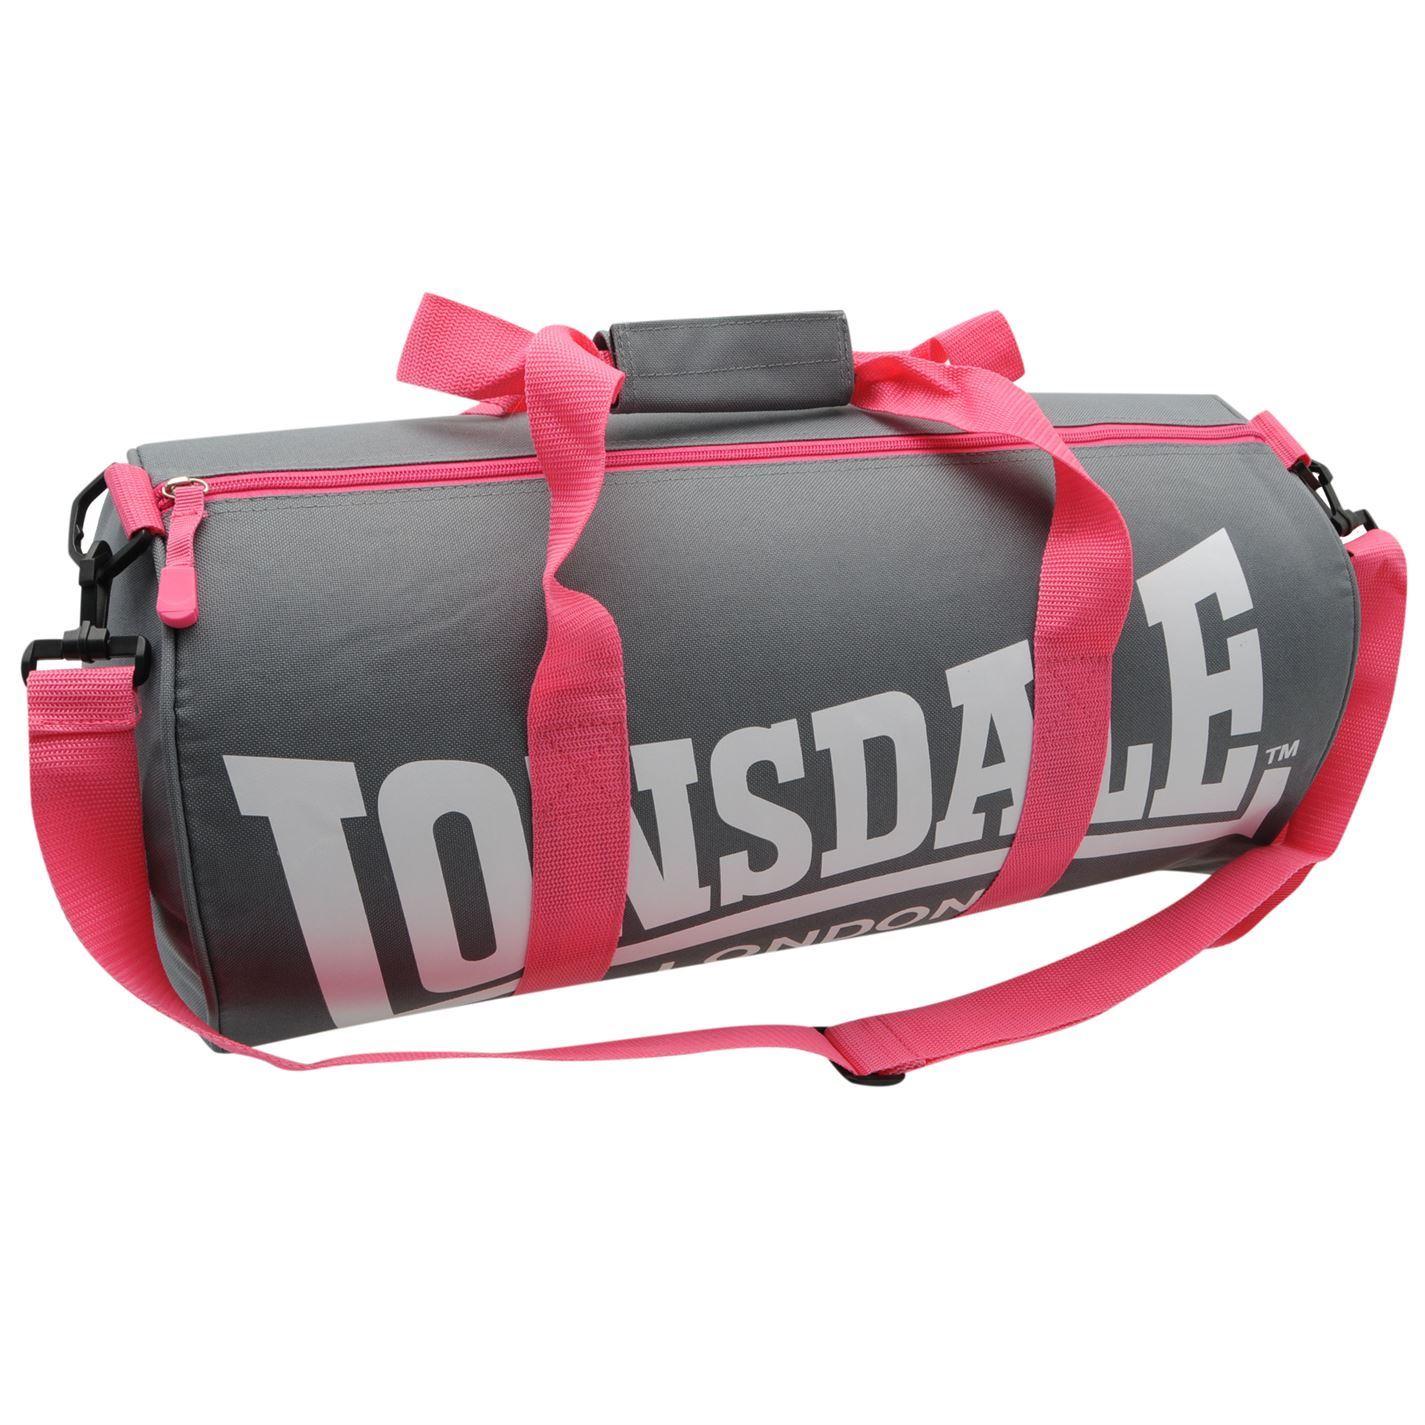 LONSDALE London Barrel Bag Holdall Boxing Sports Kitbag Gym Sports